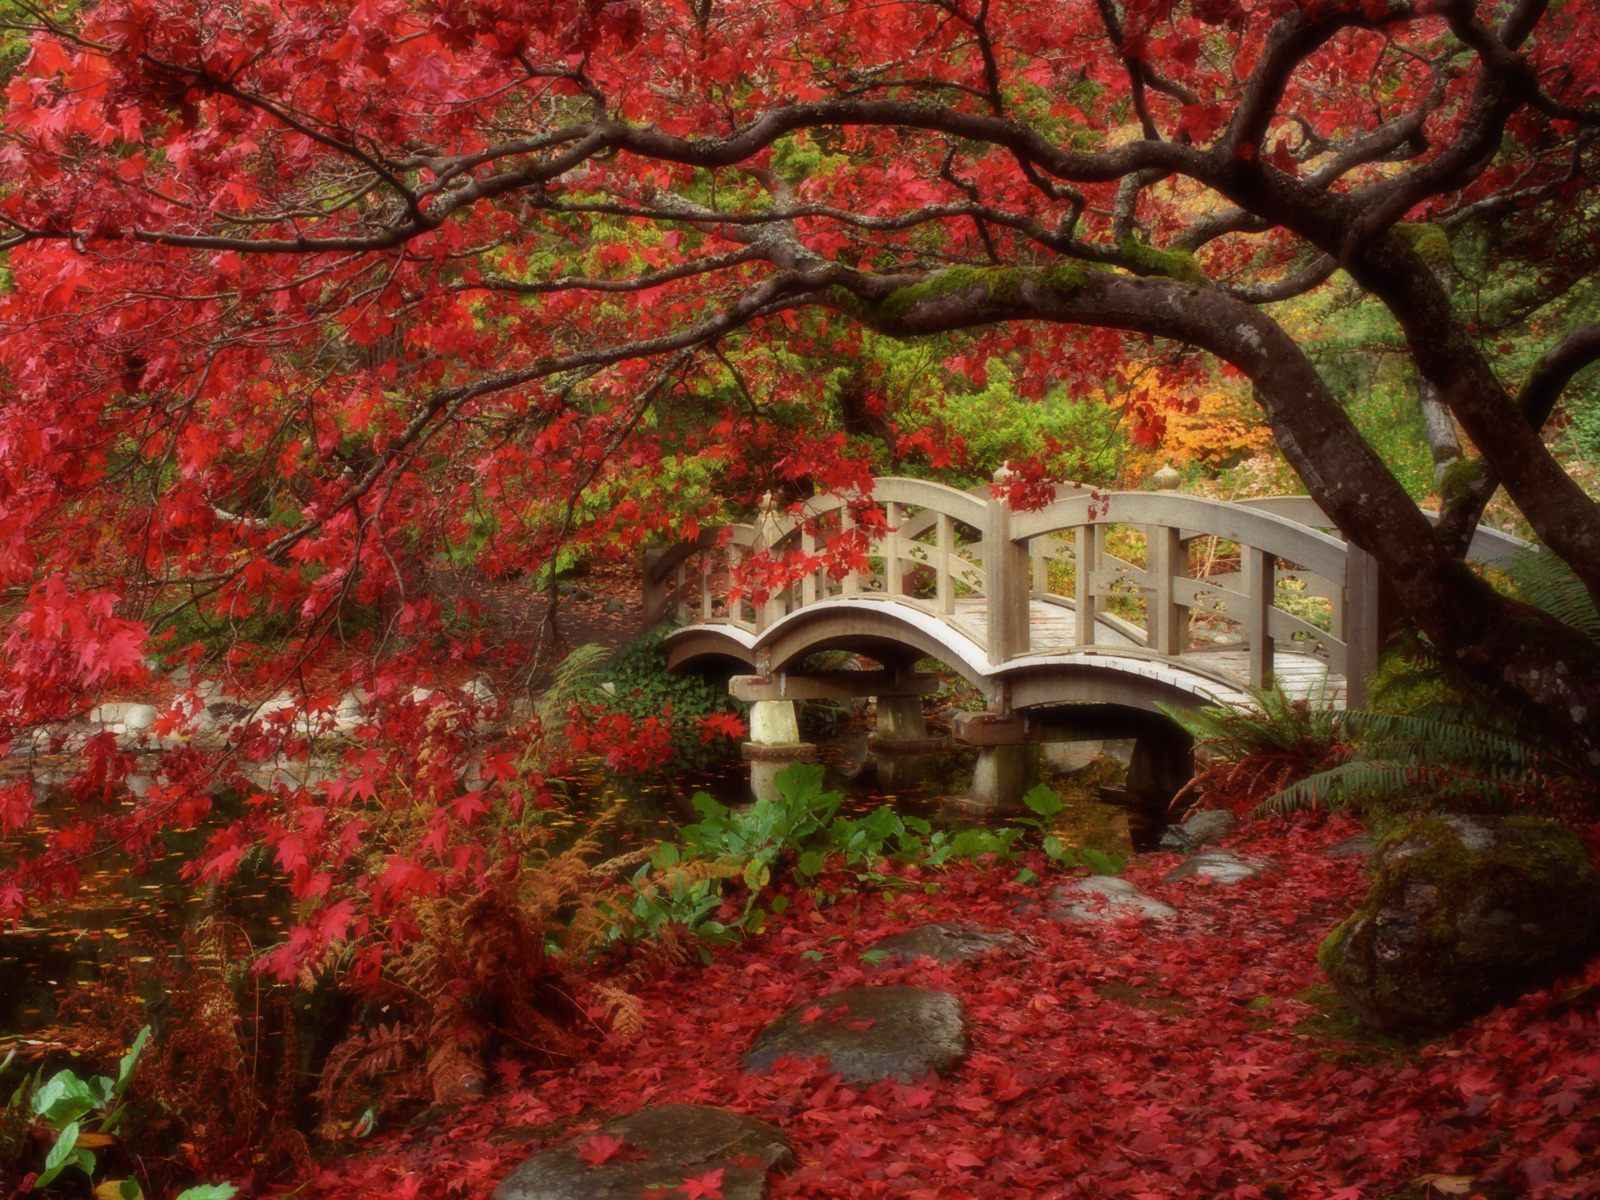 Autumn Wallpaper 007